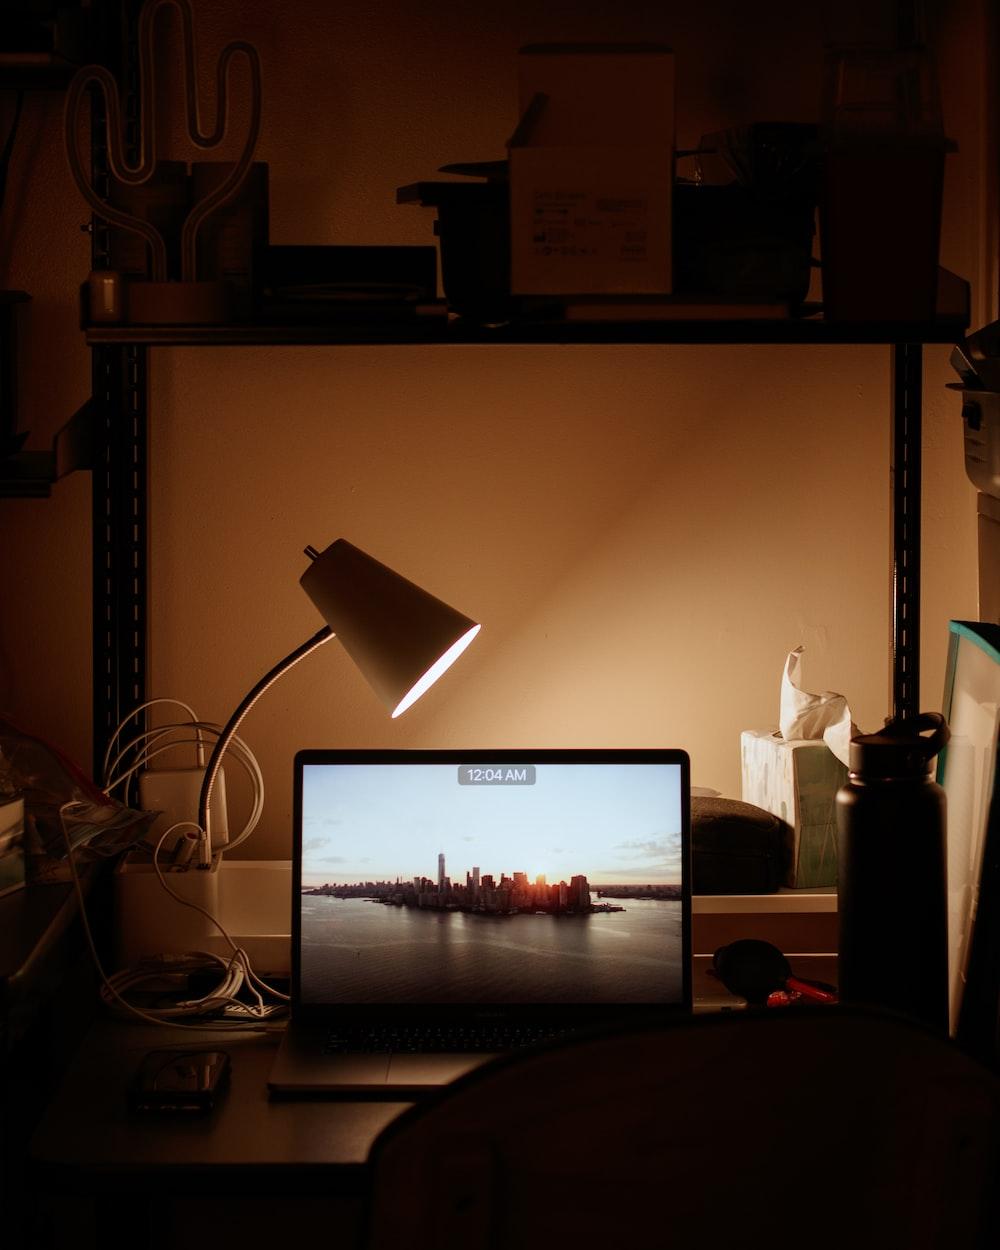 laptop turned on beside desk lamp turned on